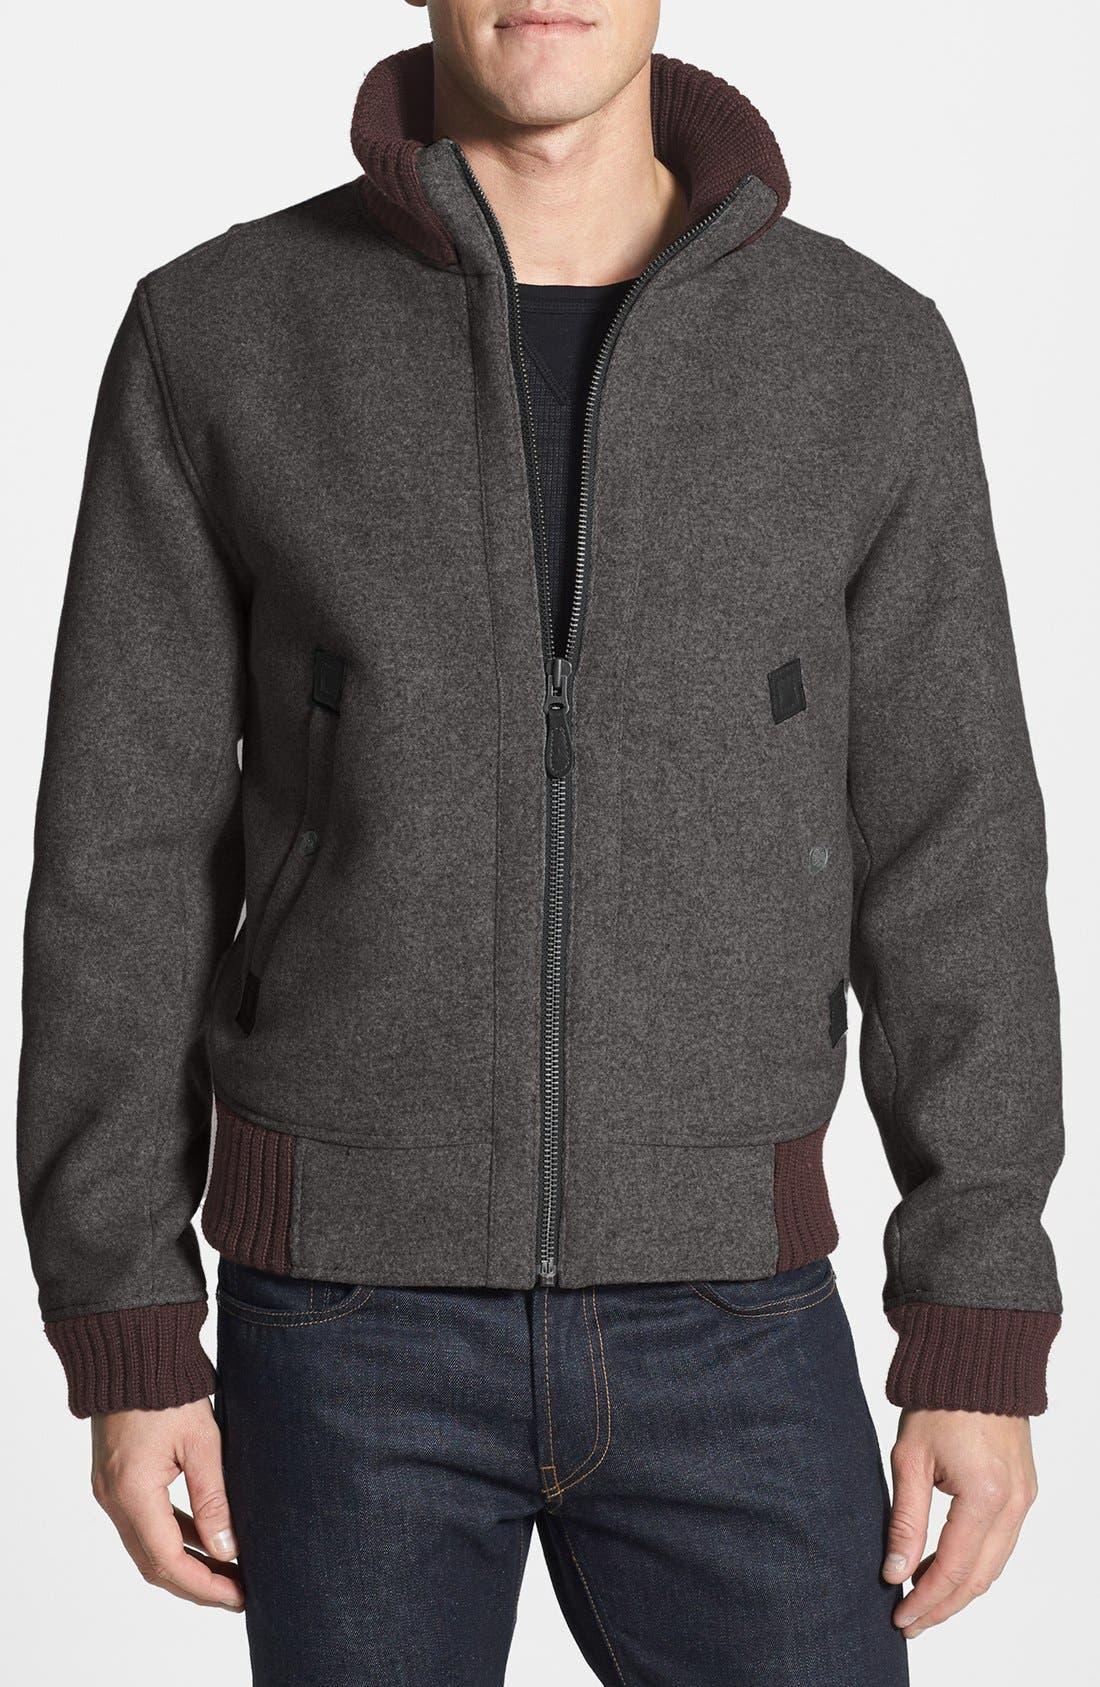 Alternate Image 1 Selected - Spiewak 'Franklin' Wool Blend Jacket